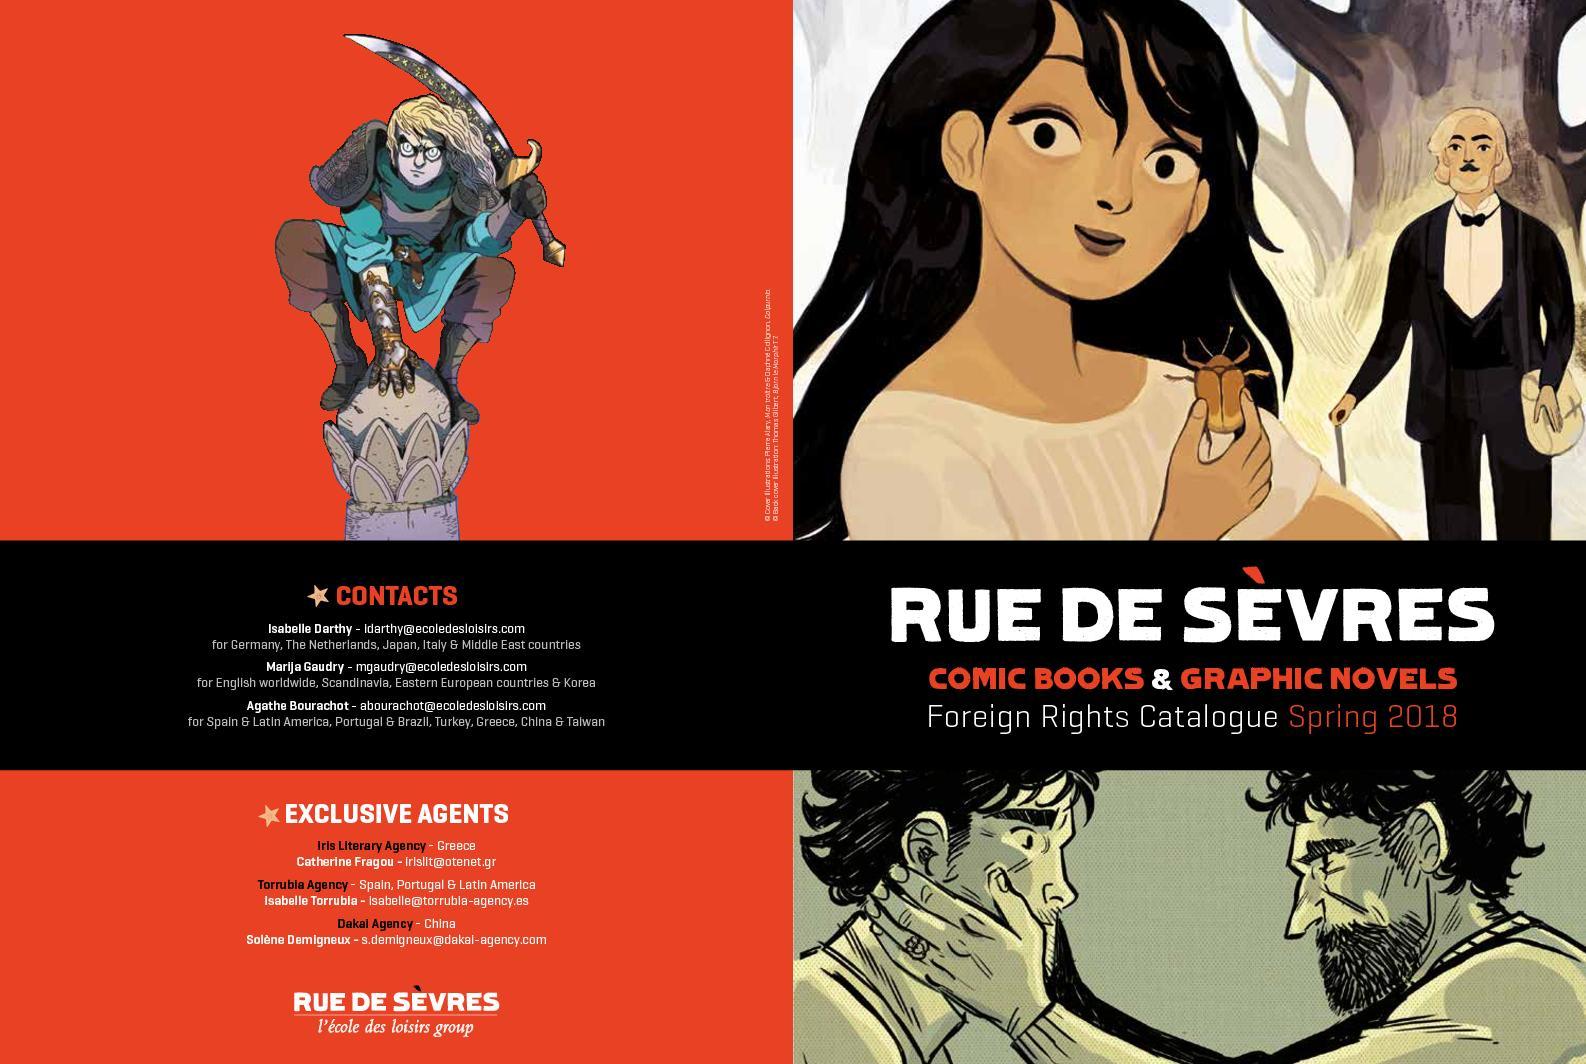 Calaméo - 2018 Spring Catalogue RUE DE SEVRES